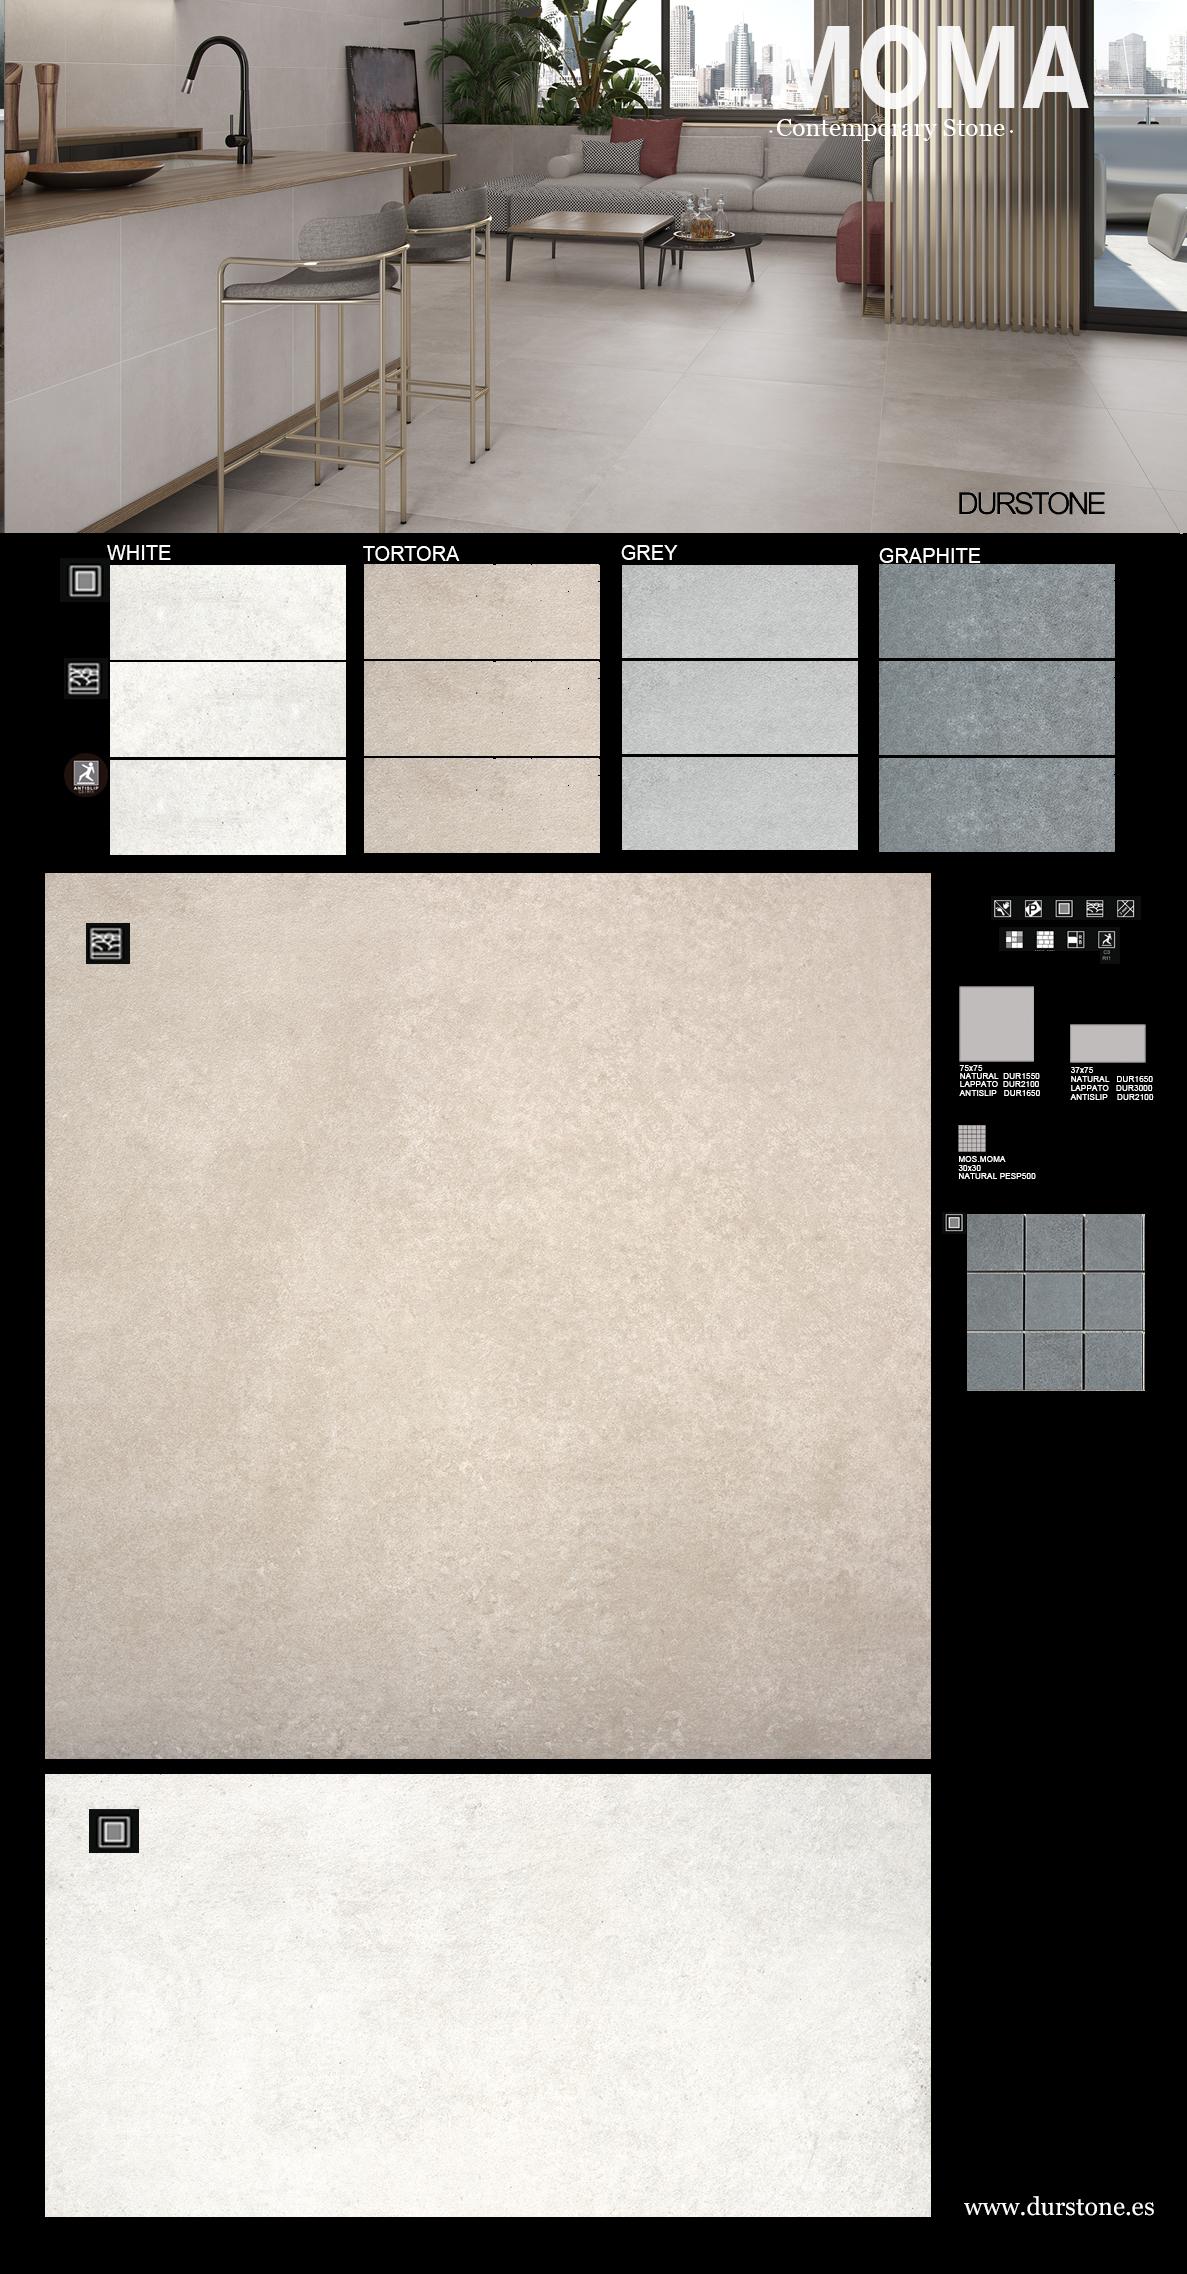 PV PANEL MOMA-1 Cod. 6039 Lap. Mat. / Cod. 6109 Mat. Lap.